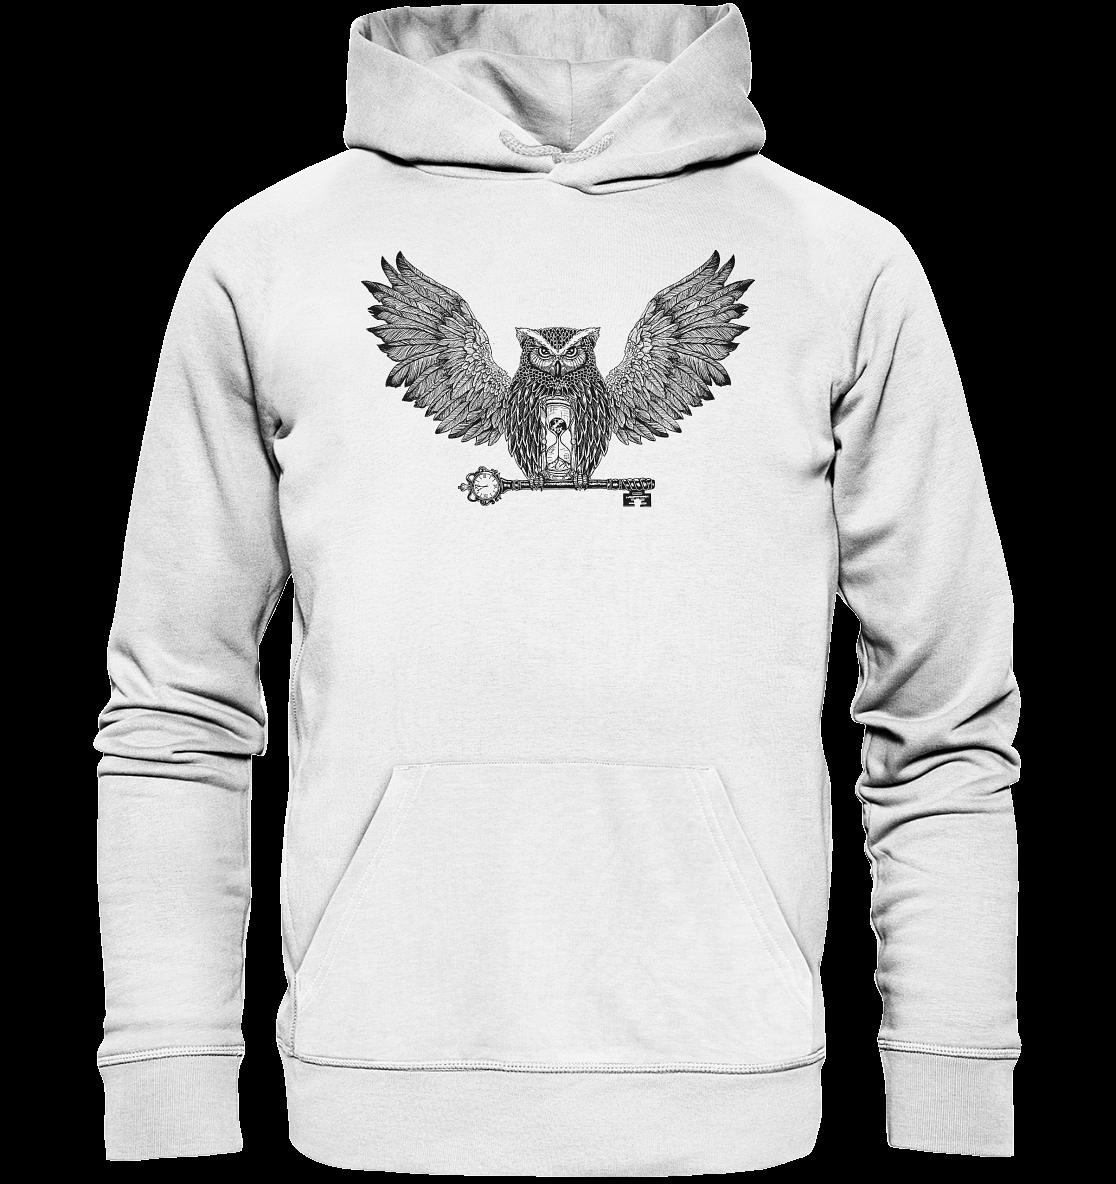 front-organic-hoodie-f8f8f8-1116x-5.png